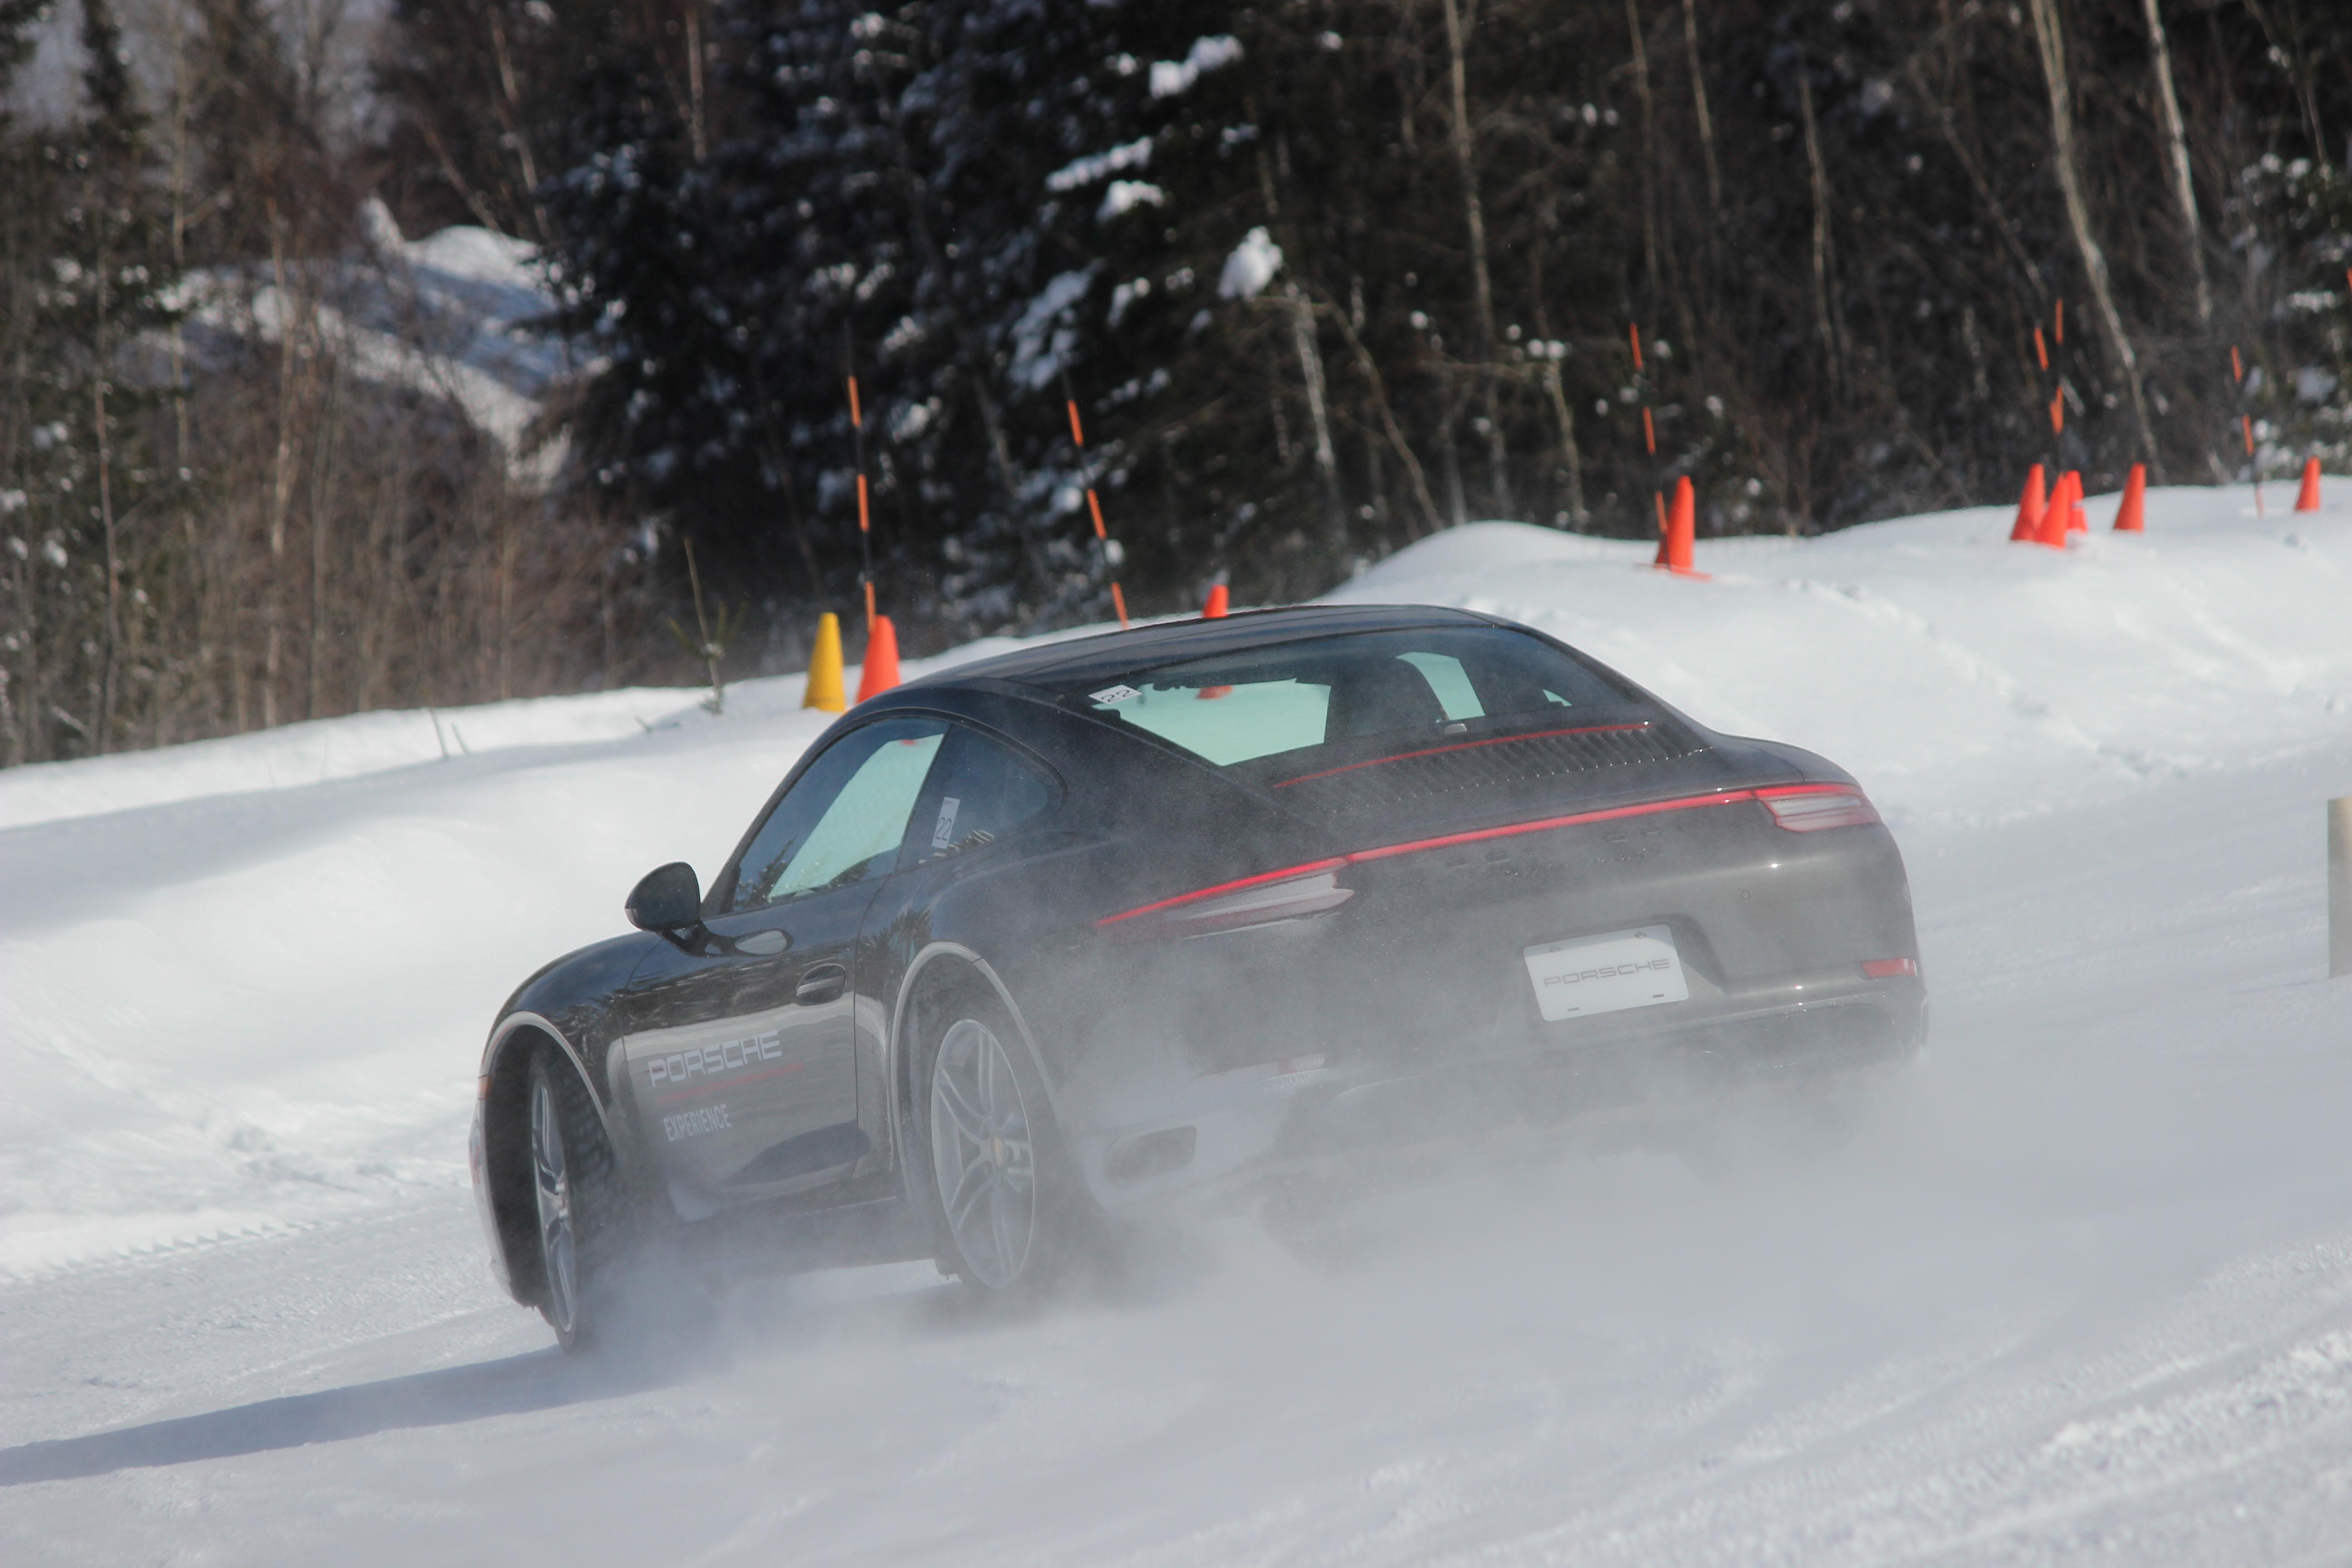 2019 Porsche Ice Experience The Art of the (Snow) Drift